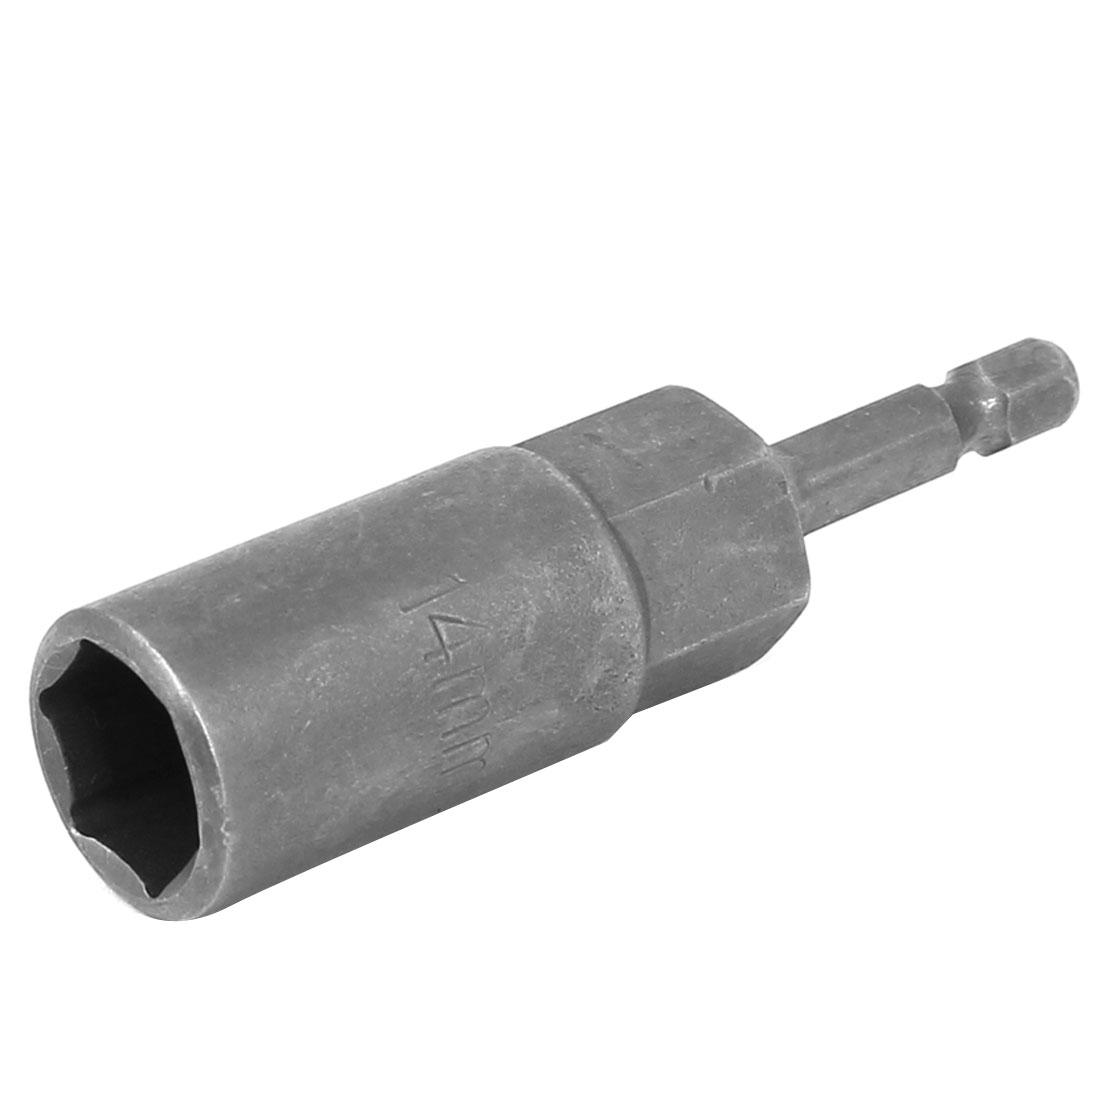 "H14 80mm Long 1/4"" Shank 14mm Hex Socket Impact Nut Setter Driver Bit Adapter"